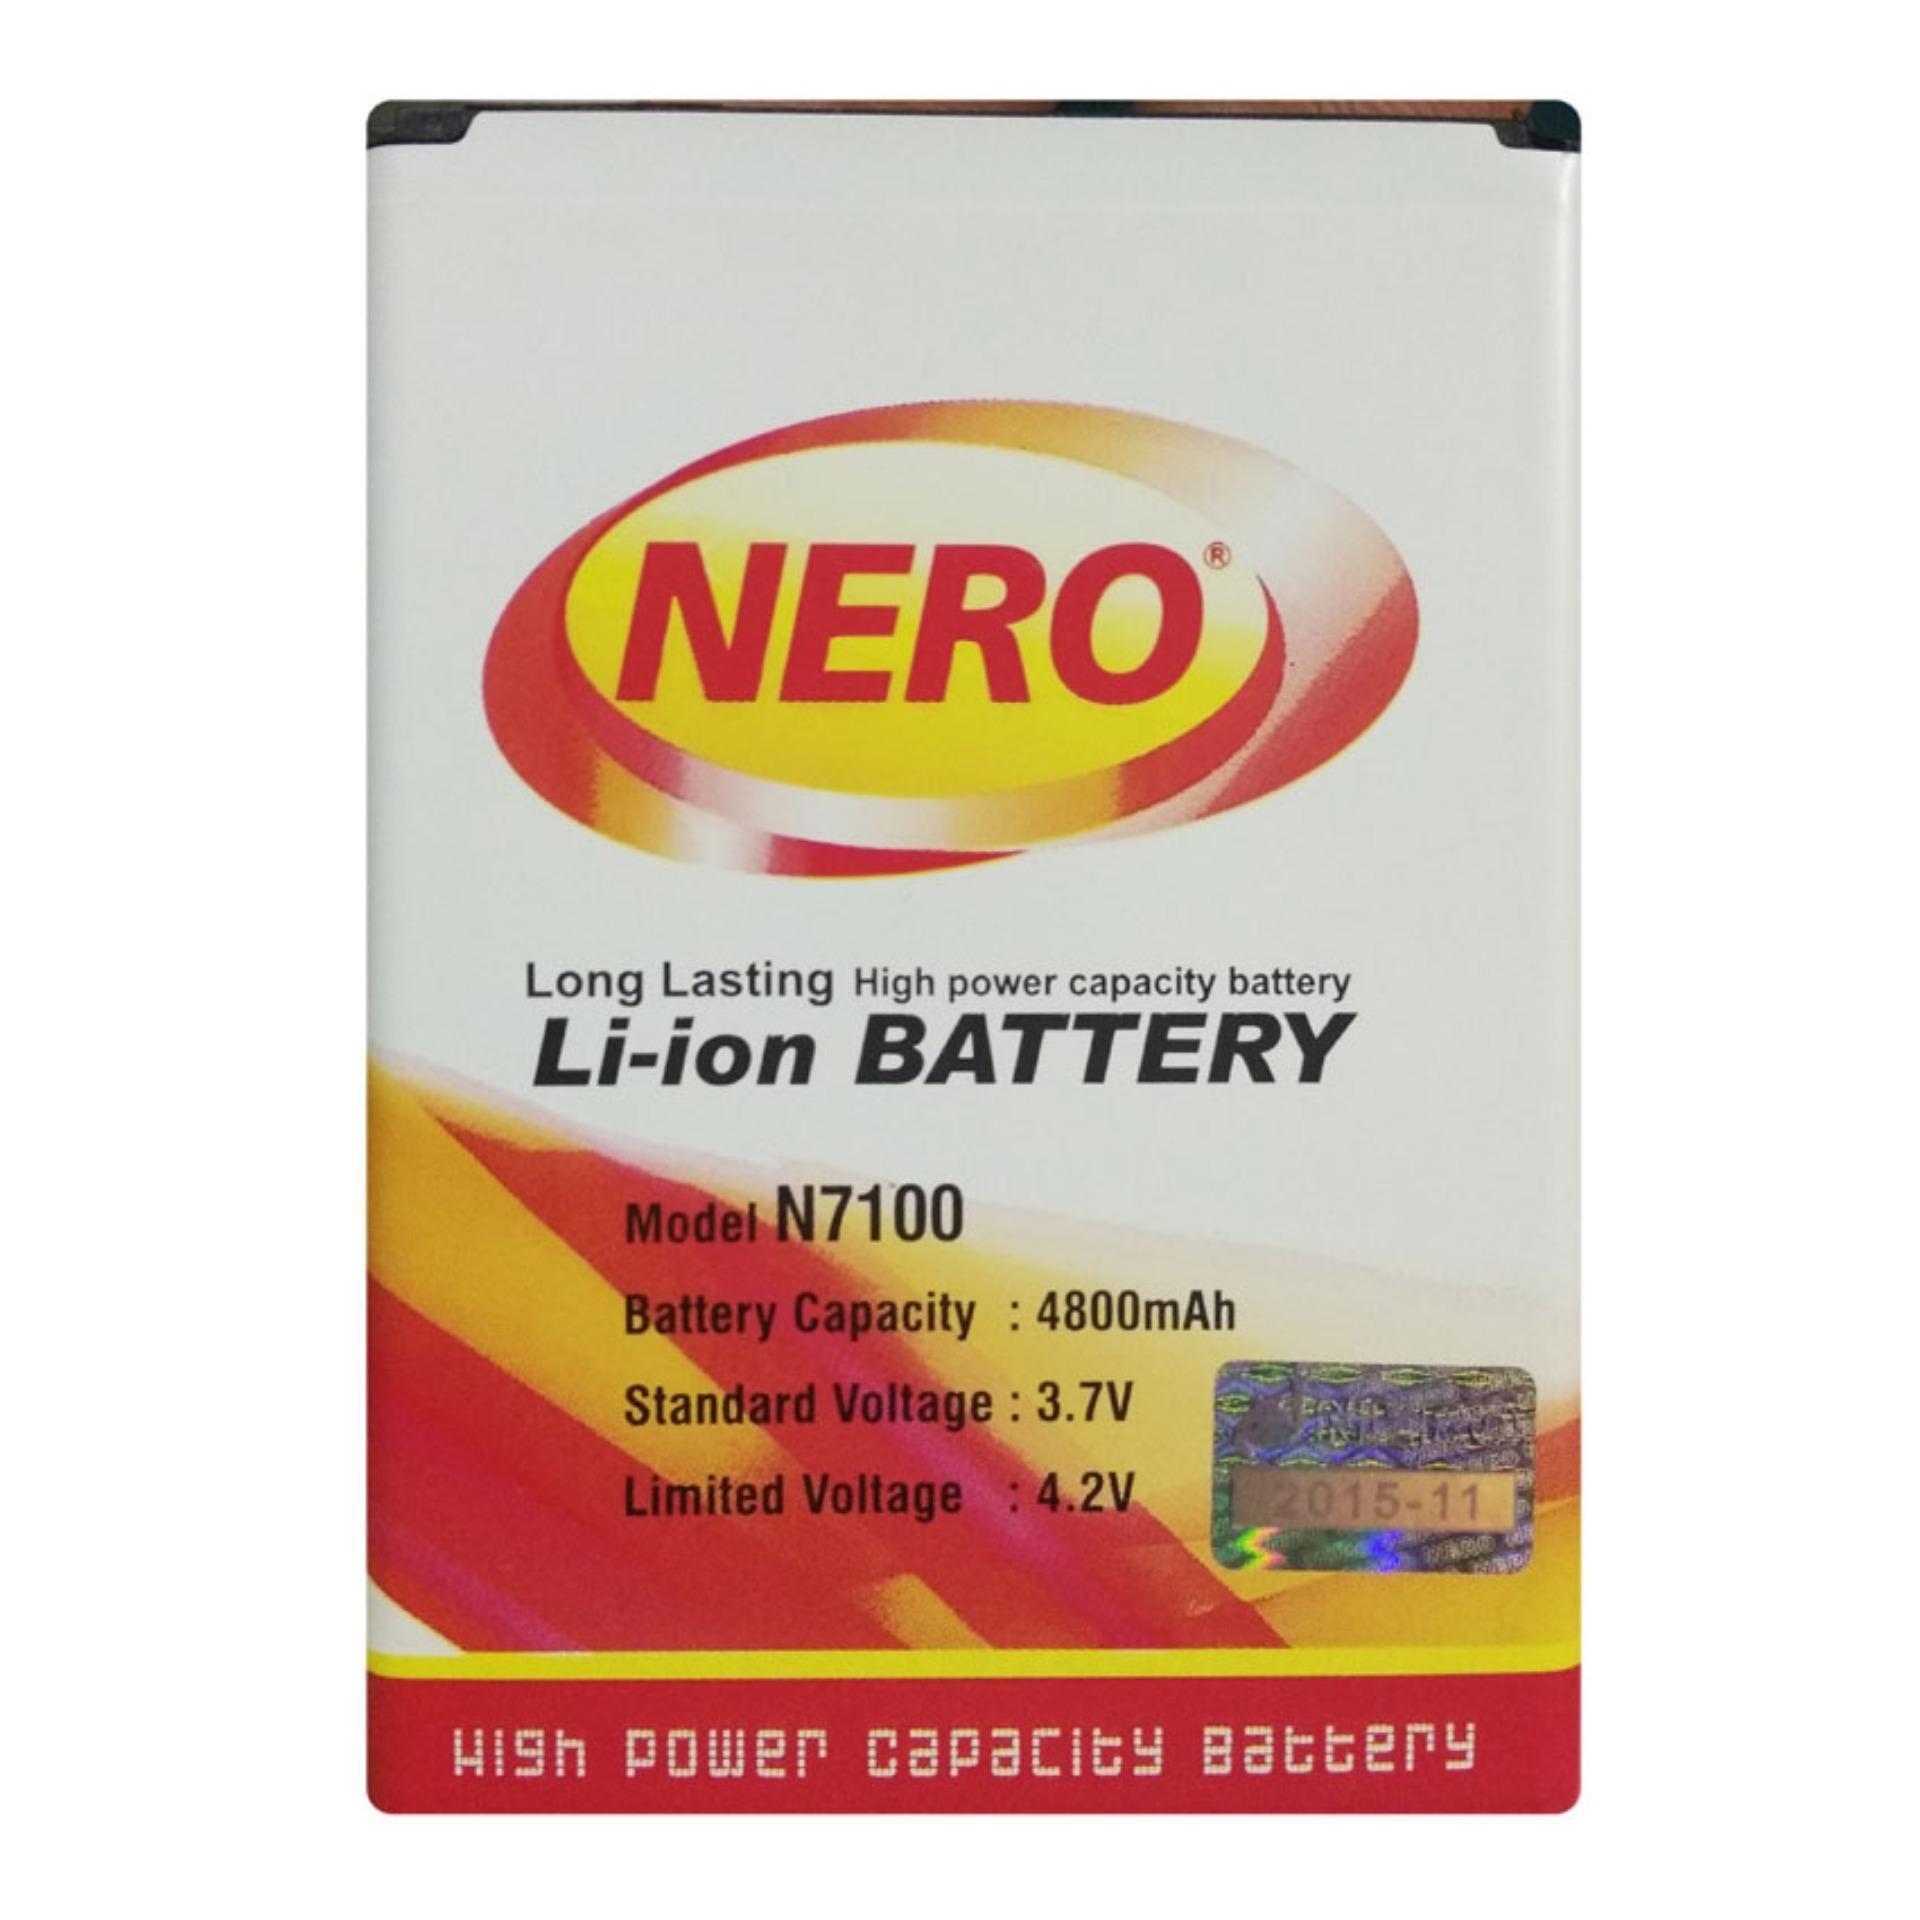 Nero Baterai Samsung Galaxy Note 2 / N7100 - Double Power Battery - 4800 mAh